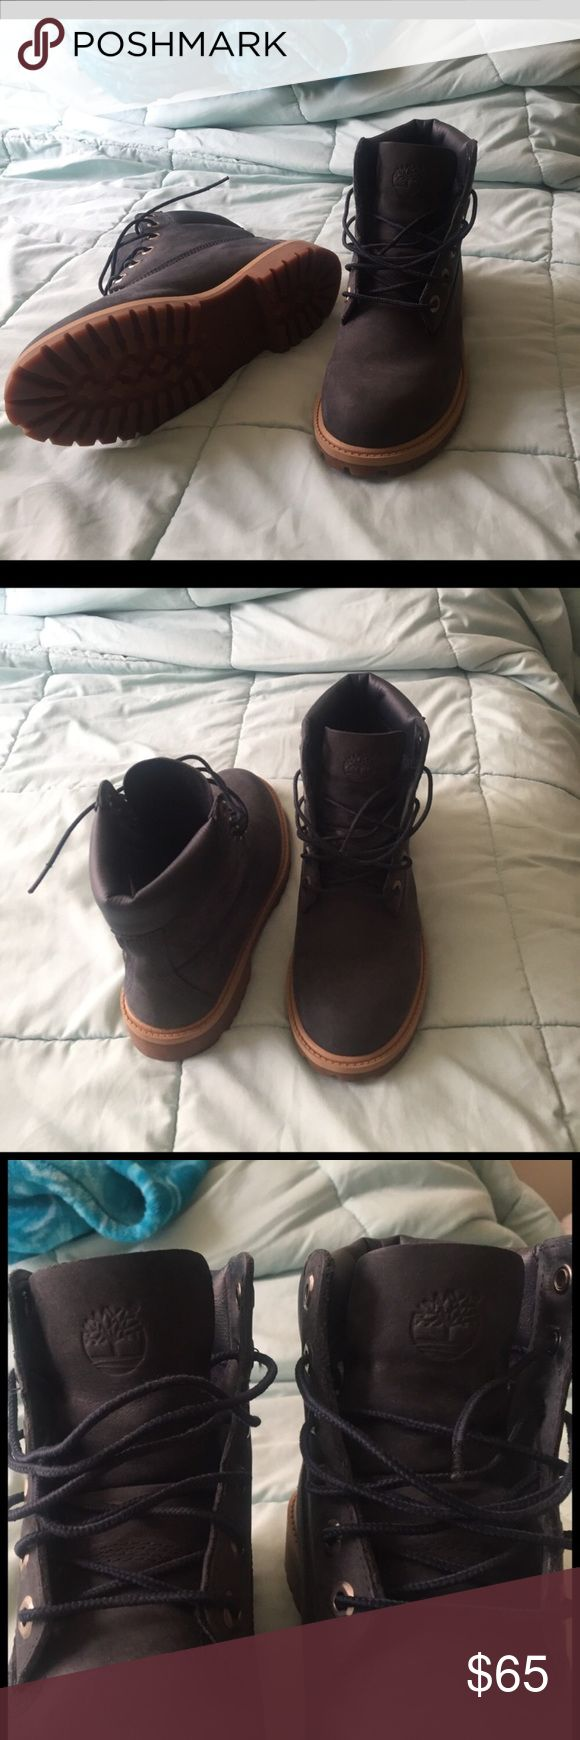 Navy Blue Timberland Boots Timberland Boots , Navy Blue , Thick Sole , Blue Shoestrings Timberland Shoes Winter & Rain Boots